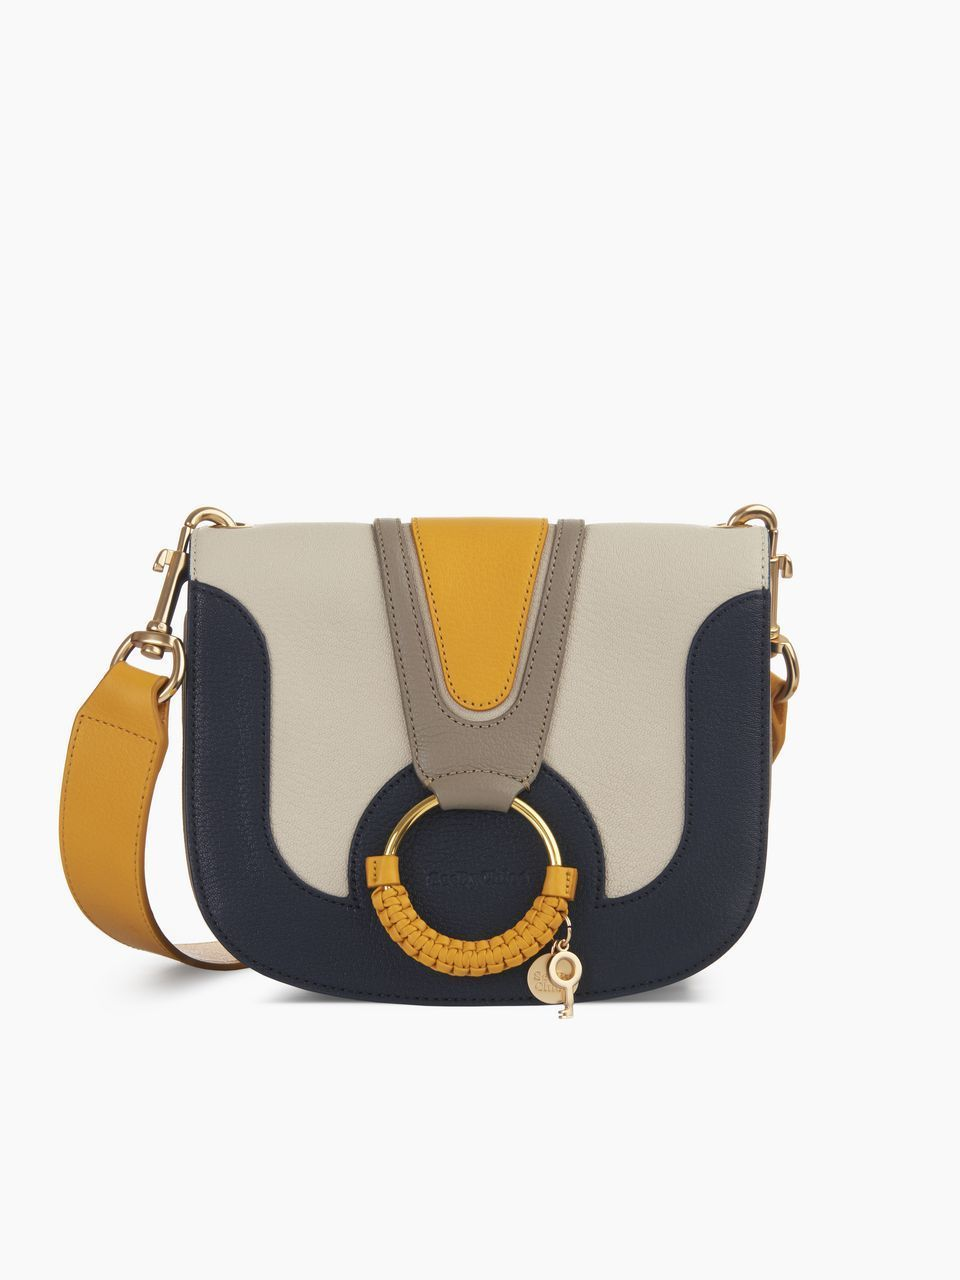 See by Chloe bag #seebychloe See by Chloe bag #seebychloe